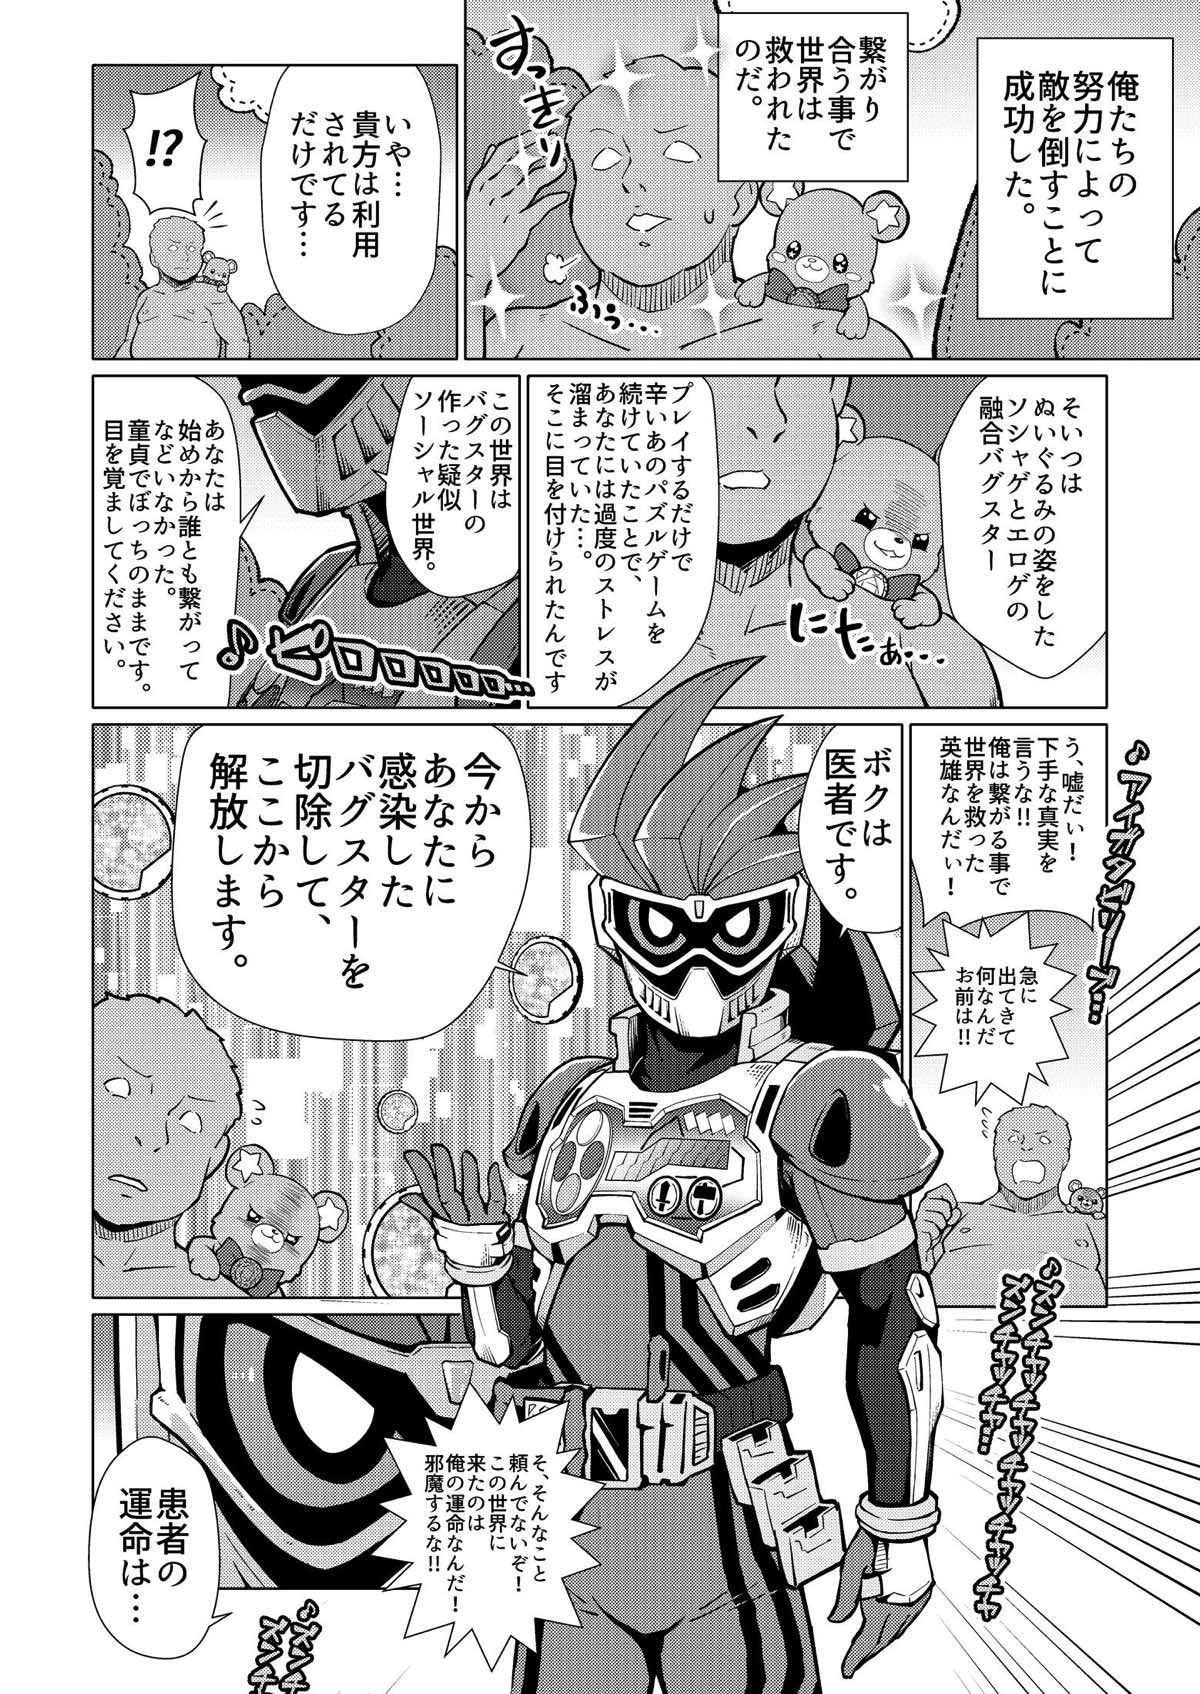 Haishin Kaishi!! Tsunagaru Puzzlun 22